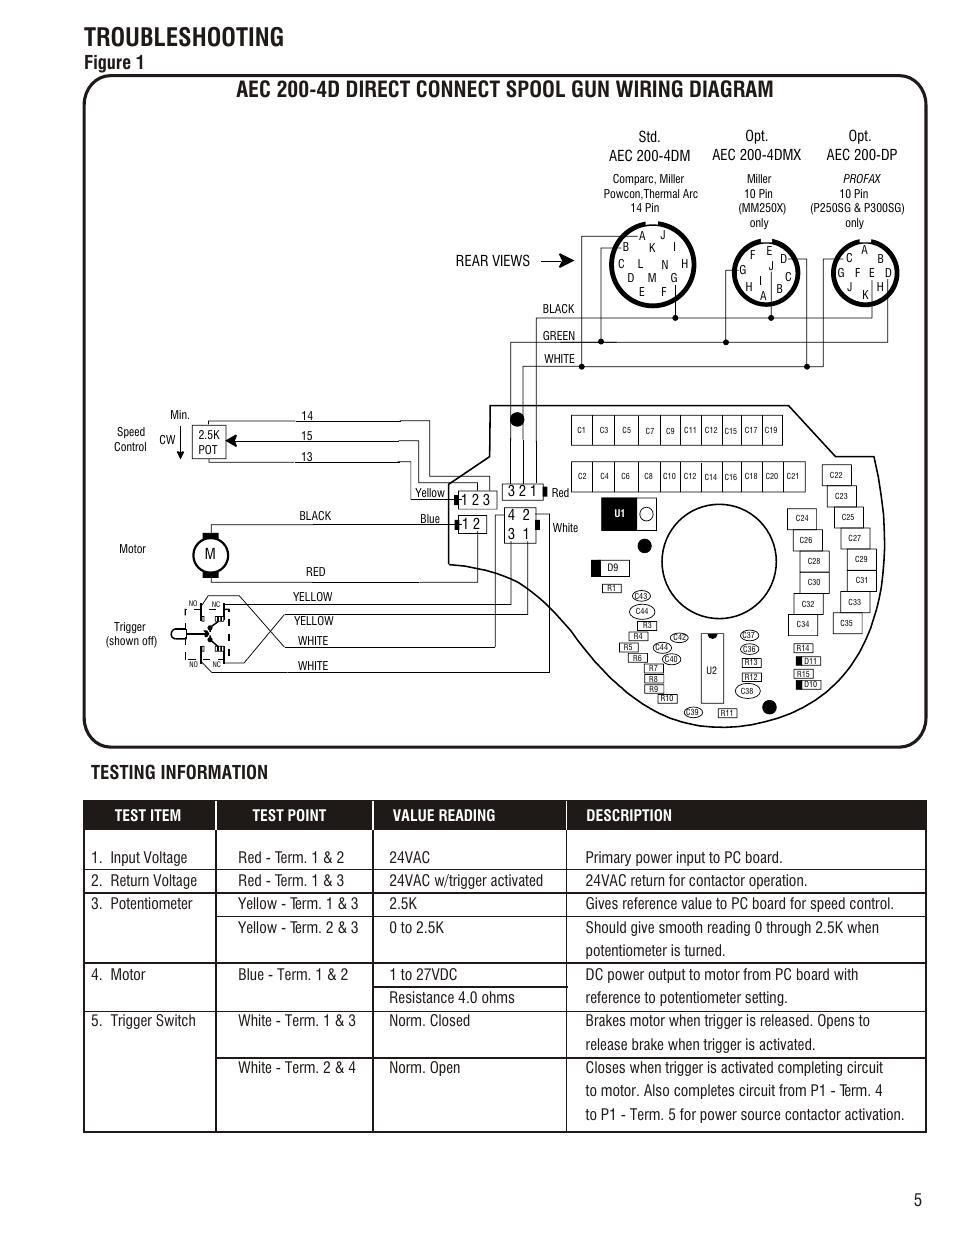 john deere 200 wiring diagram troubleshooting  aec 200 4d direct connect spool gun wiring  aec 200 4d direct connect spool gun